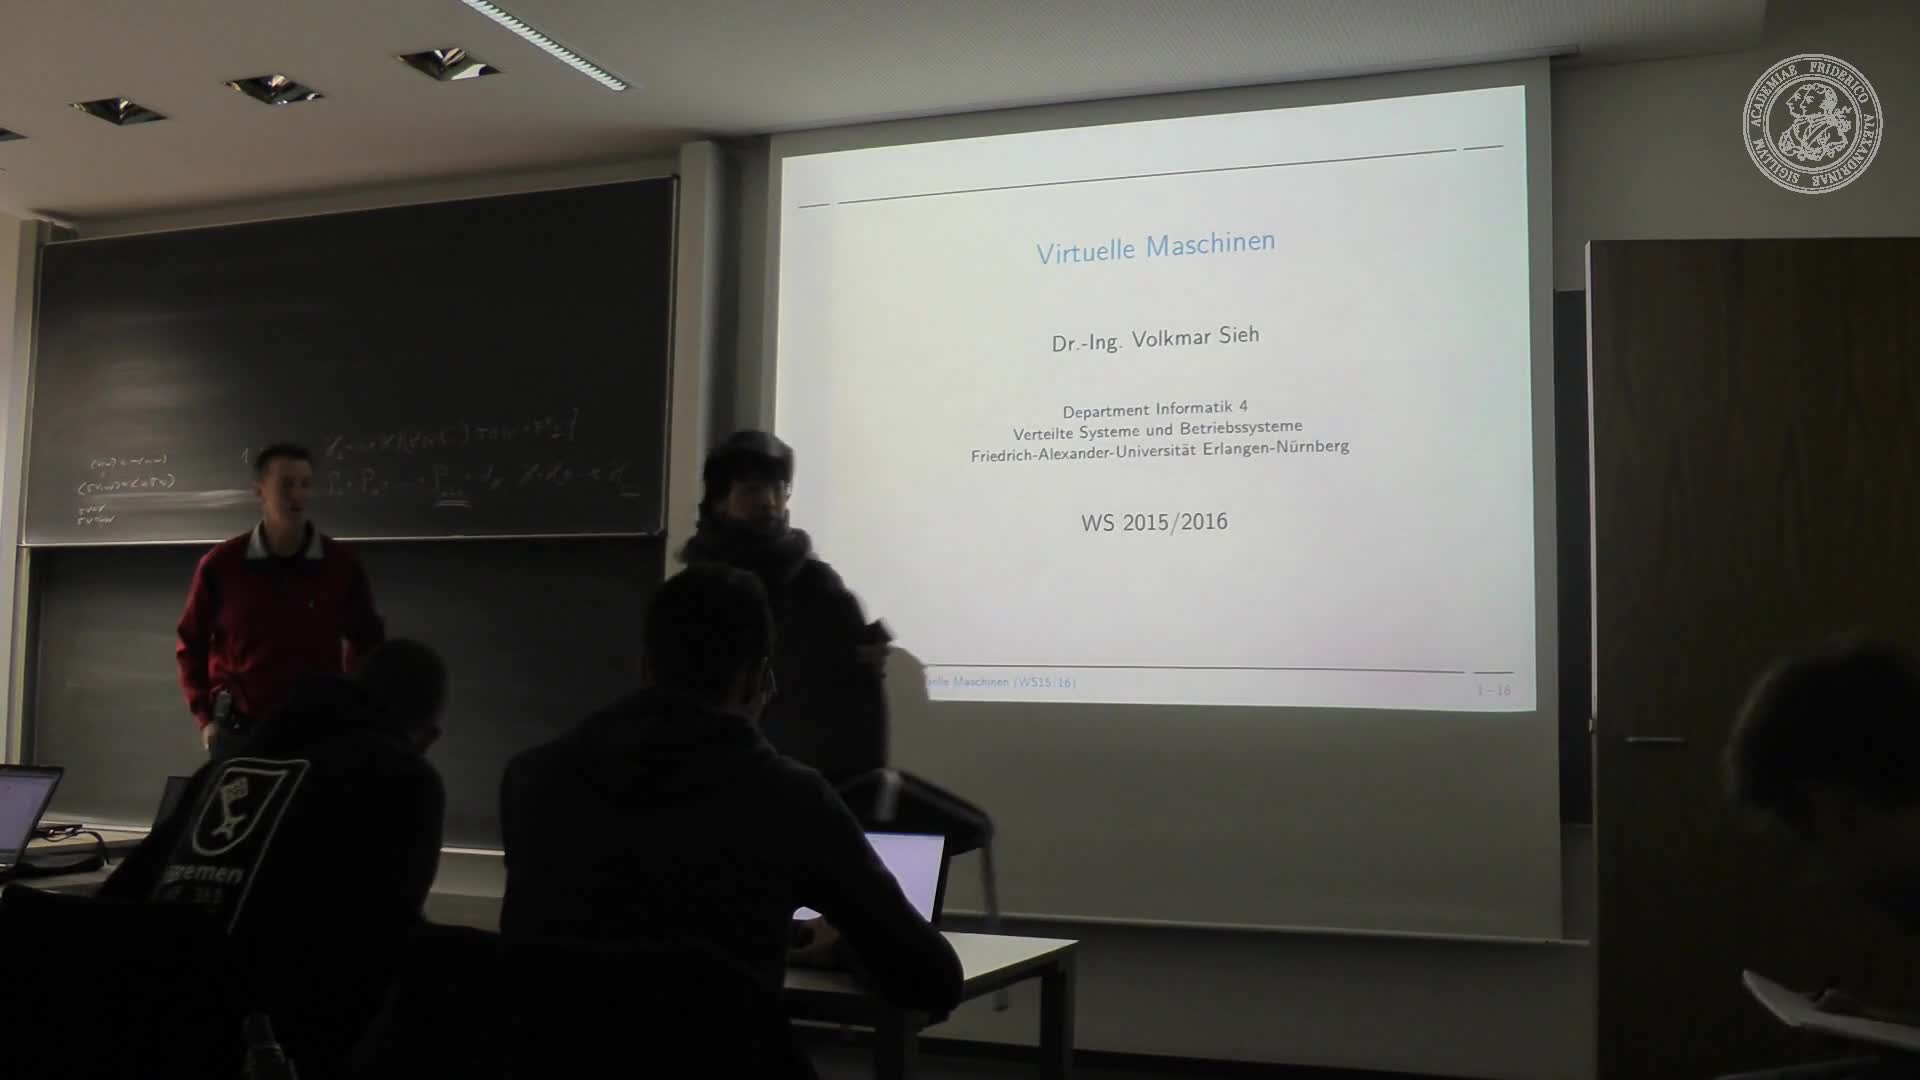 Virtuelle Maschinen preview image